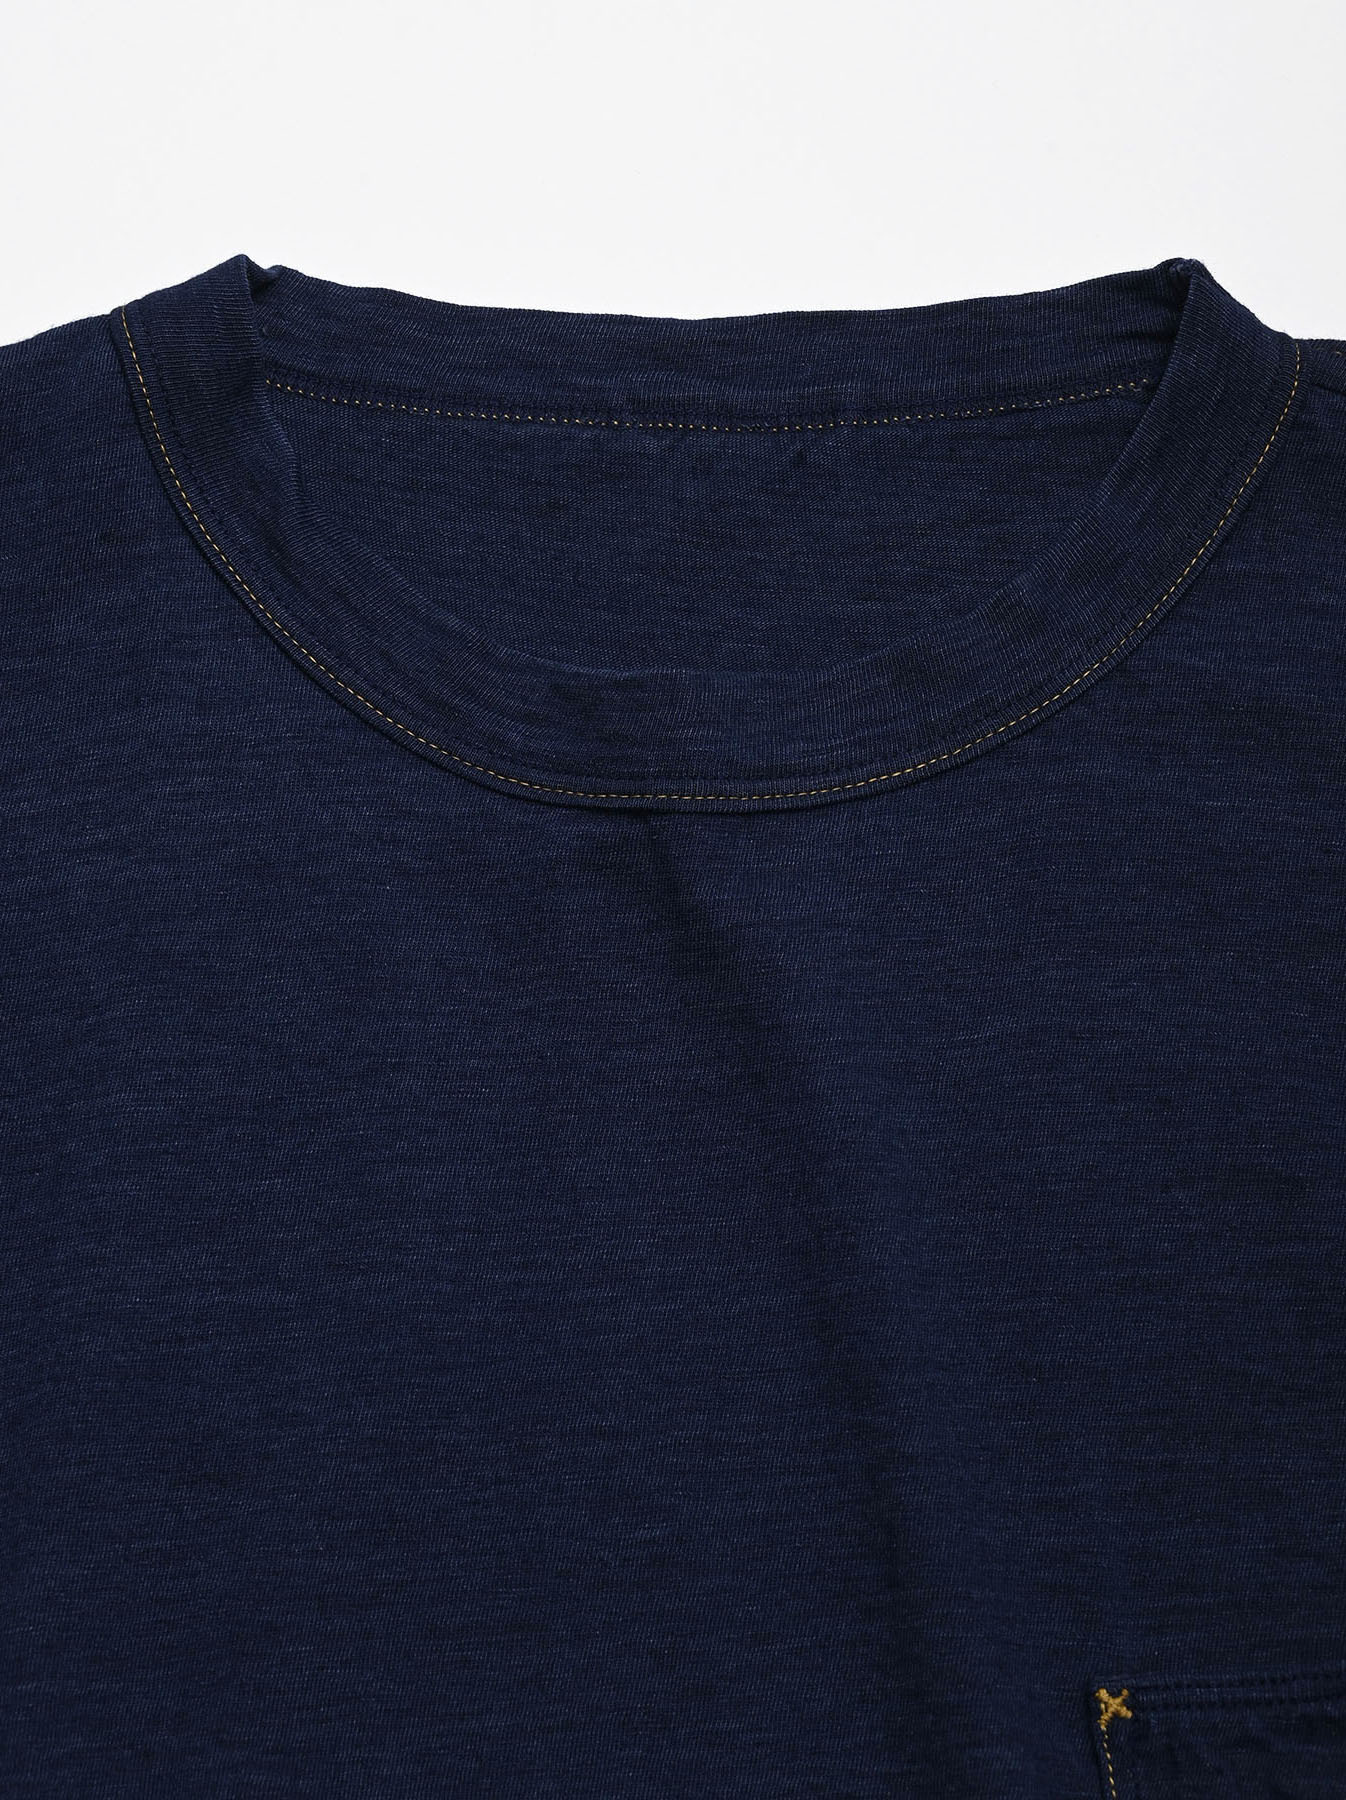 One Wash Indigo Tenjiku 908 Ocean T-Shirt (0621)-11